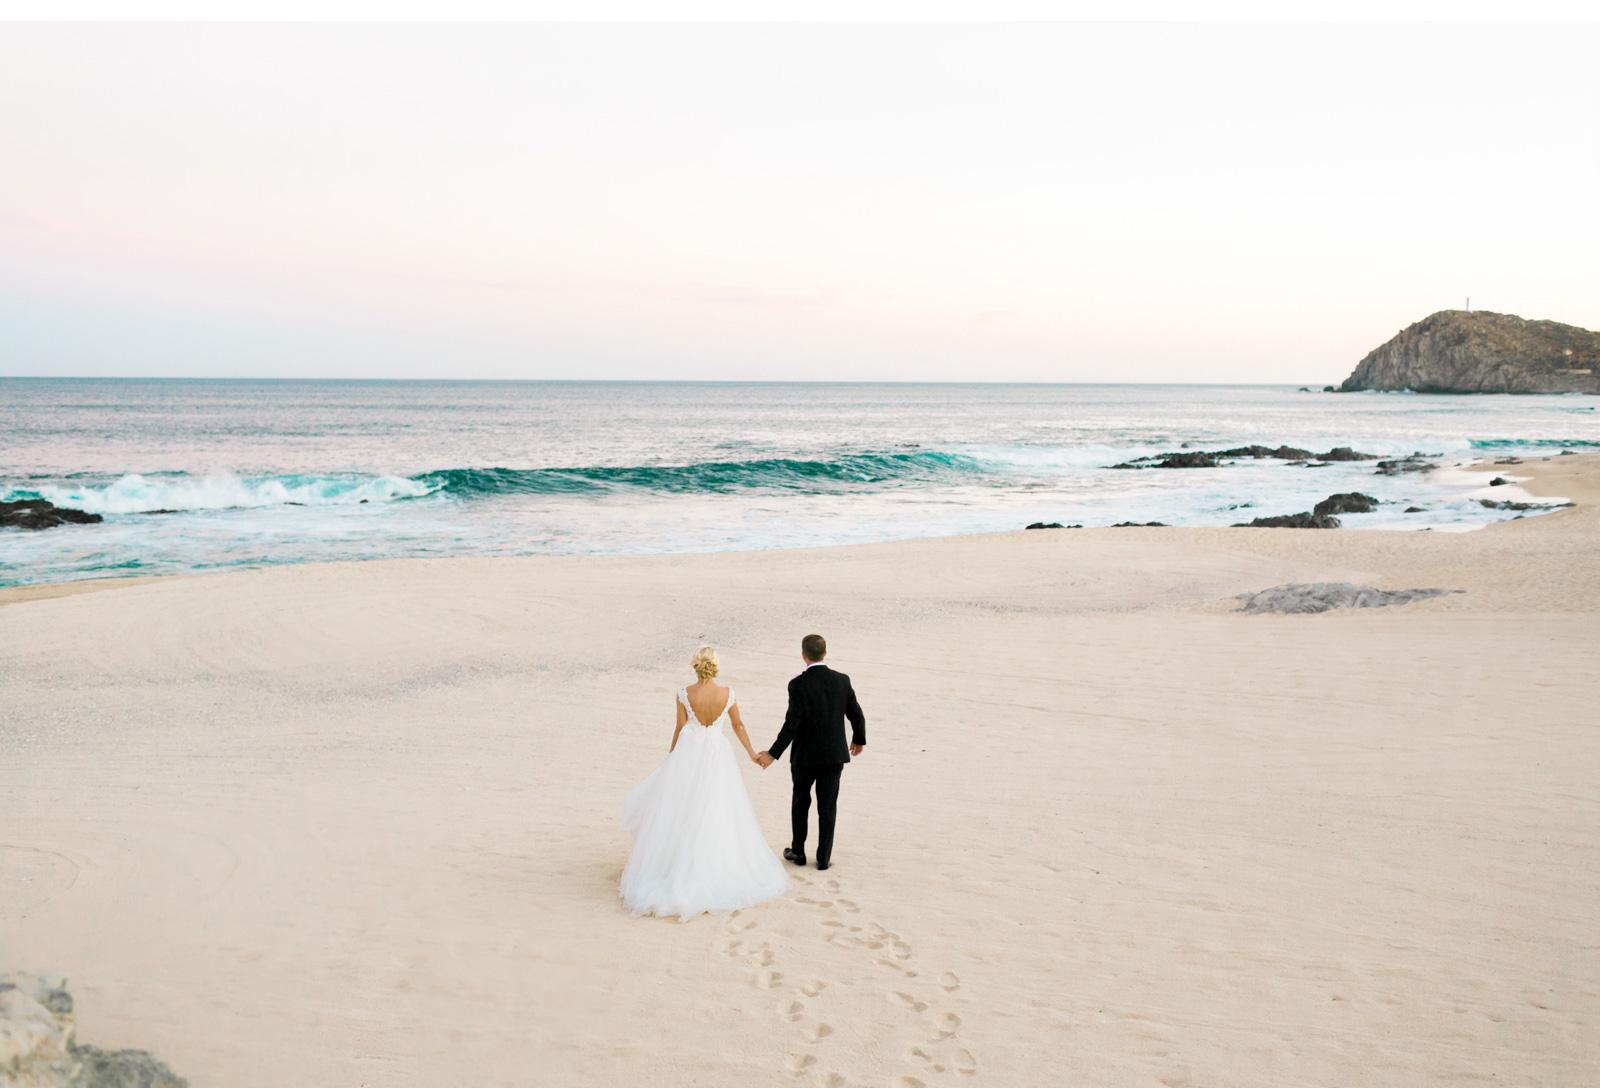 Hawaii-Destination-Wedding-Natalie-Schutt-Photography-Style-Me-Pretty_02.jpg